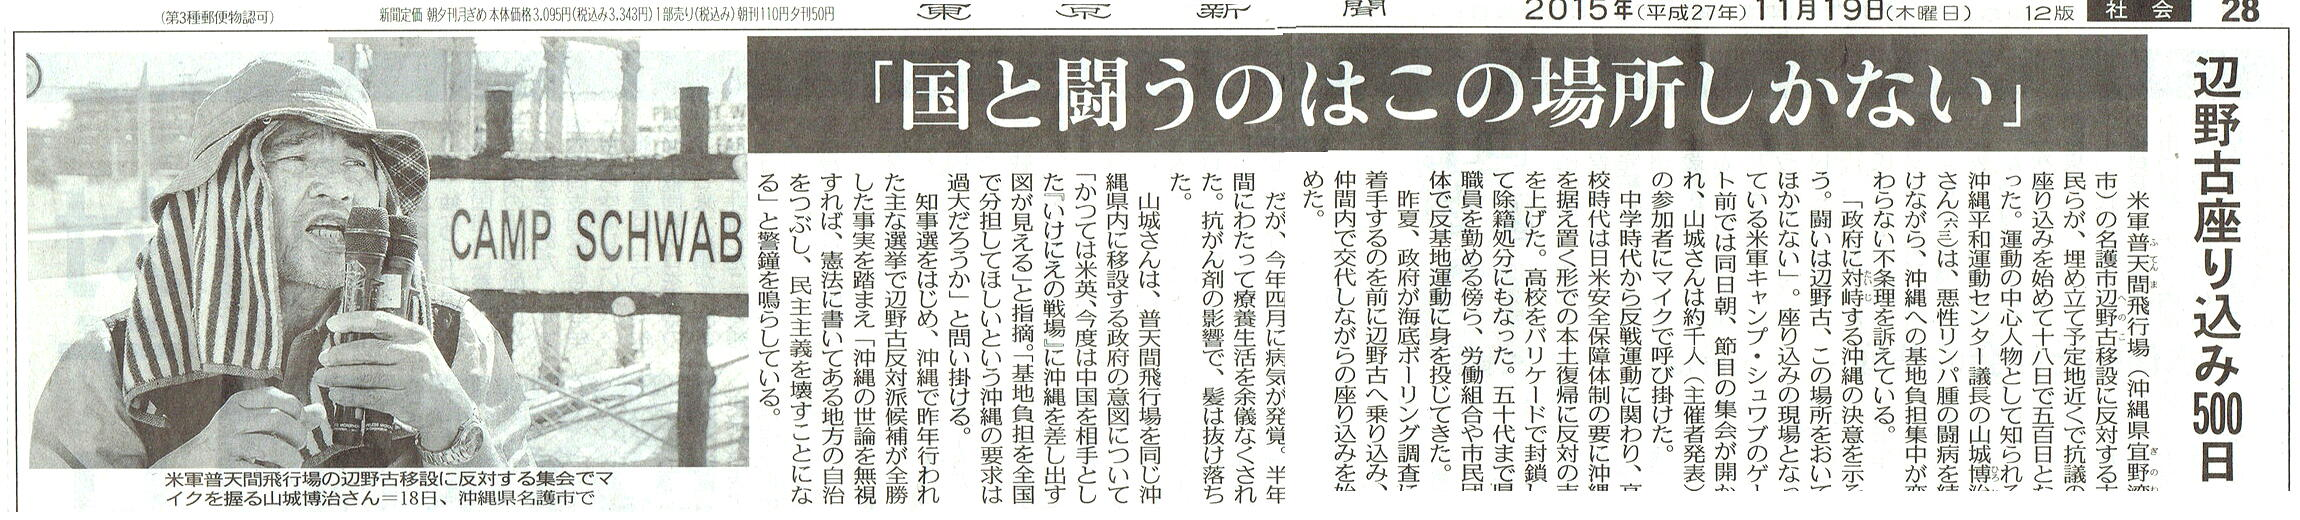 tokyo2015 1119